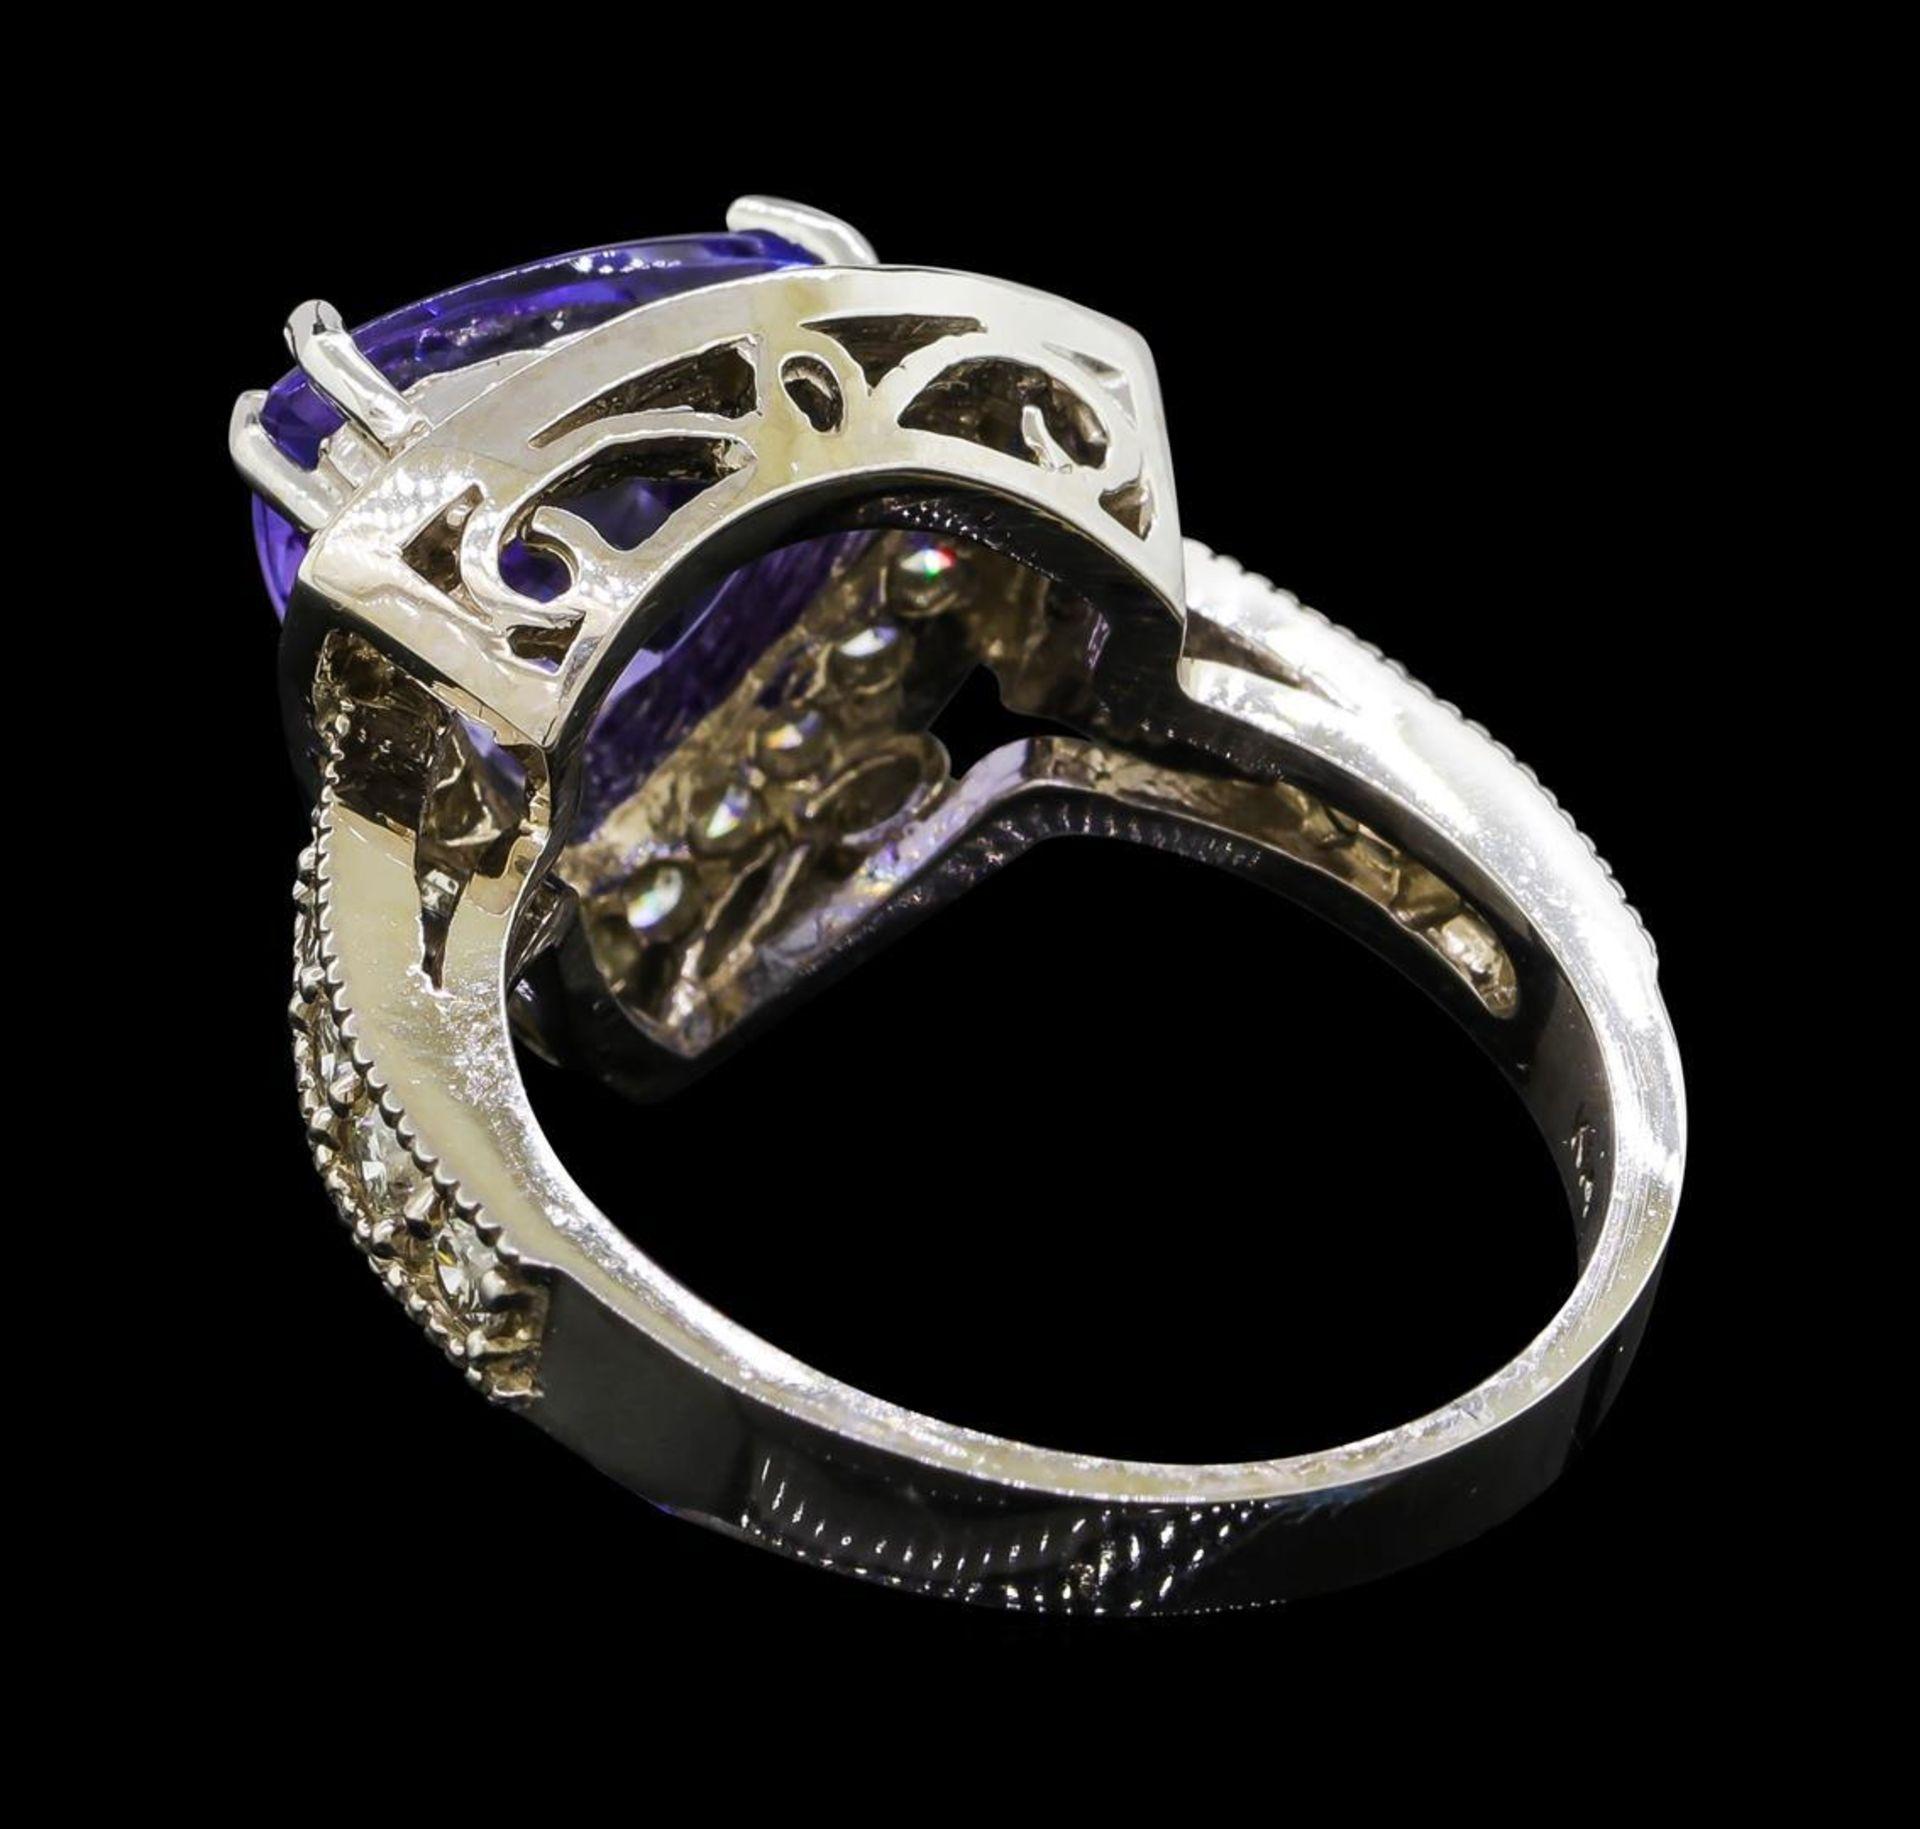 3.72 ctw Tanzanite and Diamond Ring - 14KT White Gold - Image 3 of 5